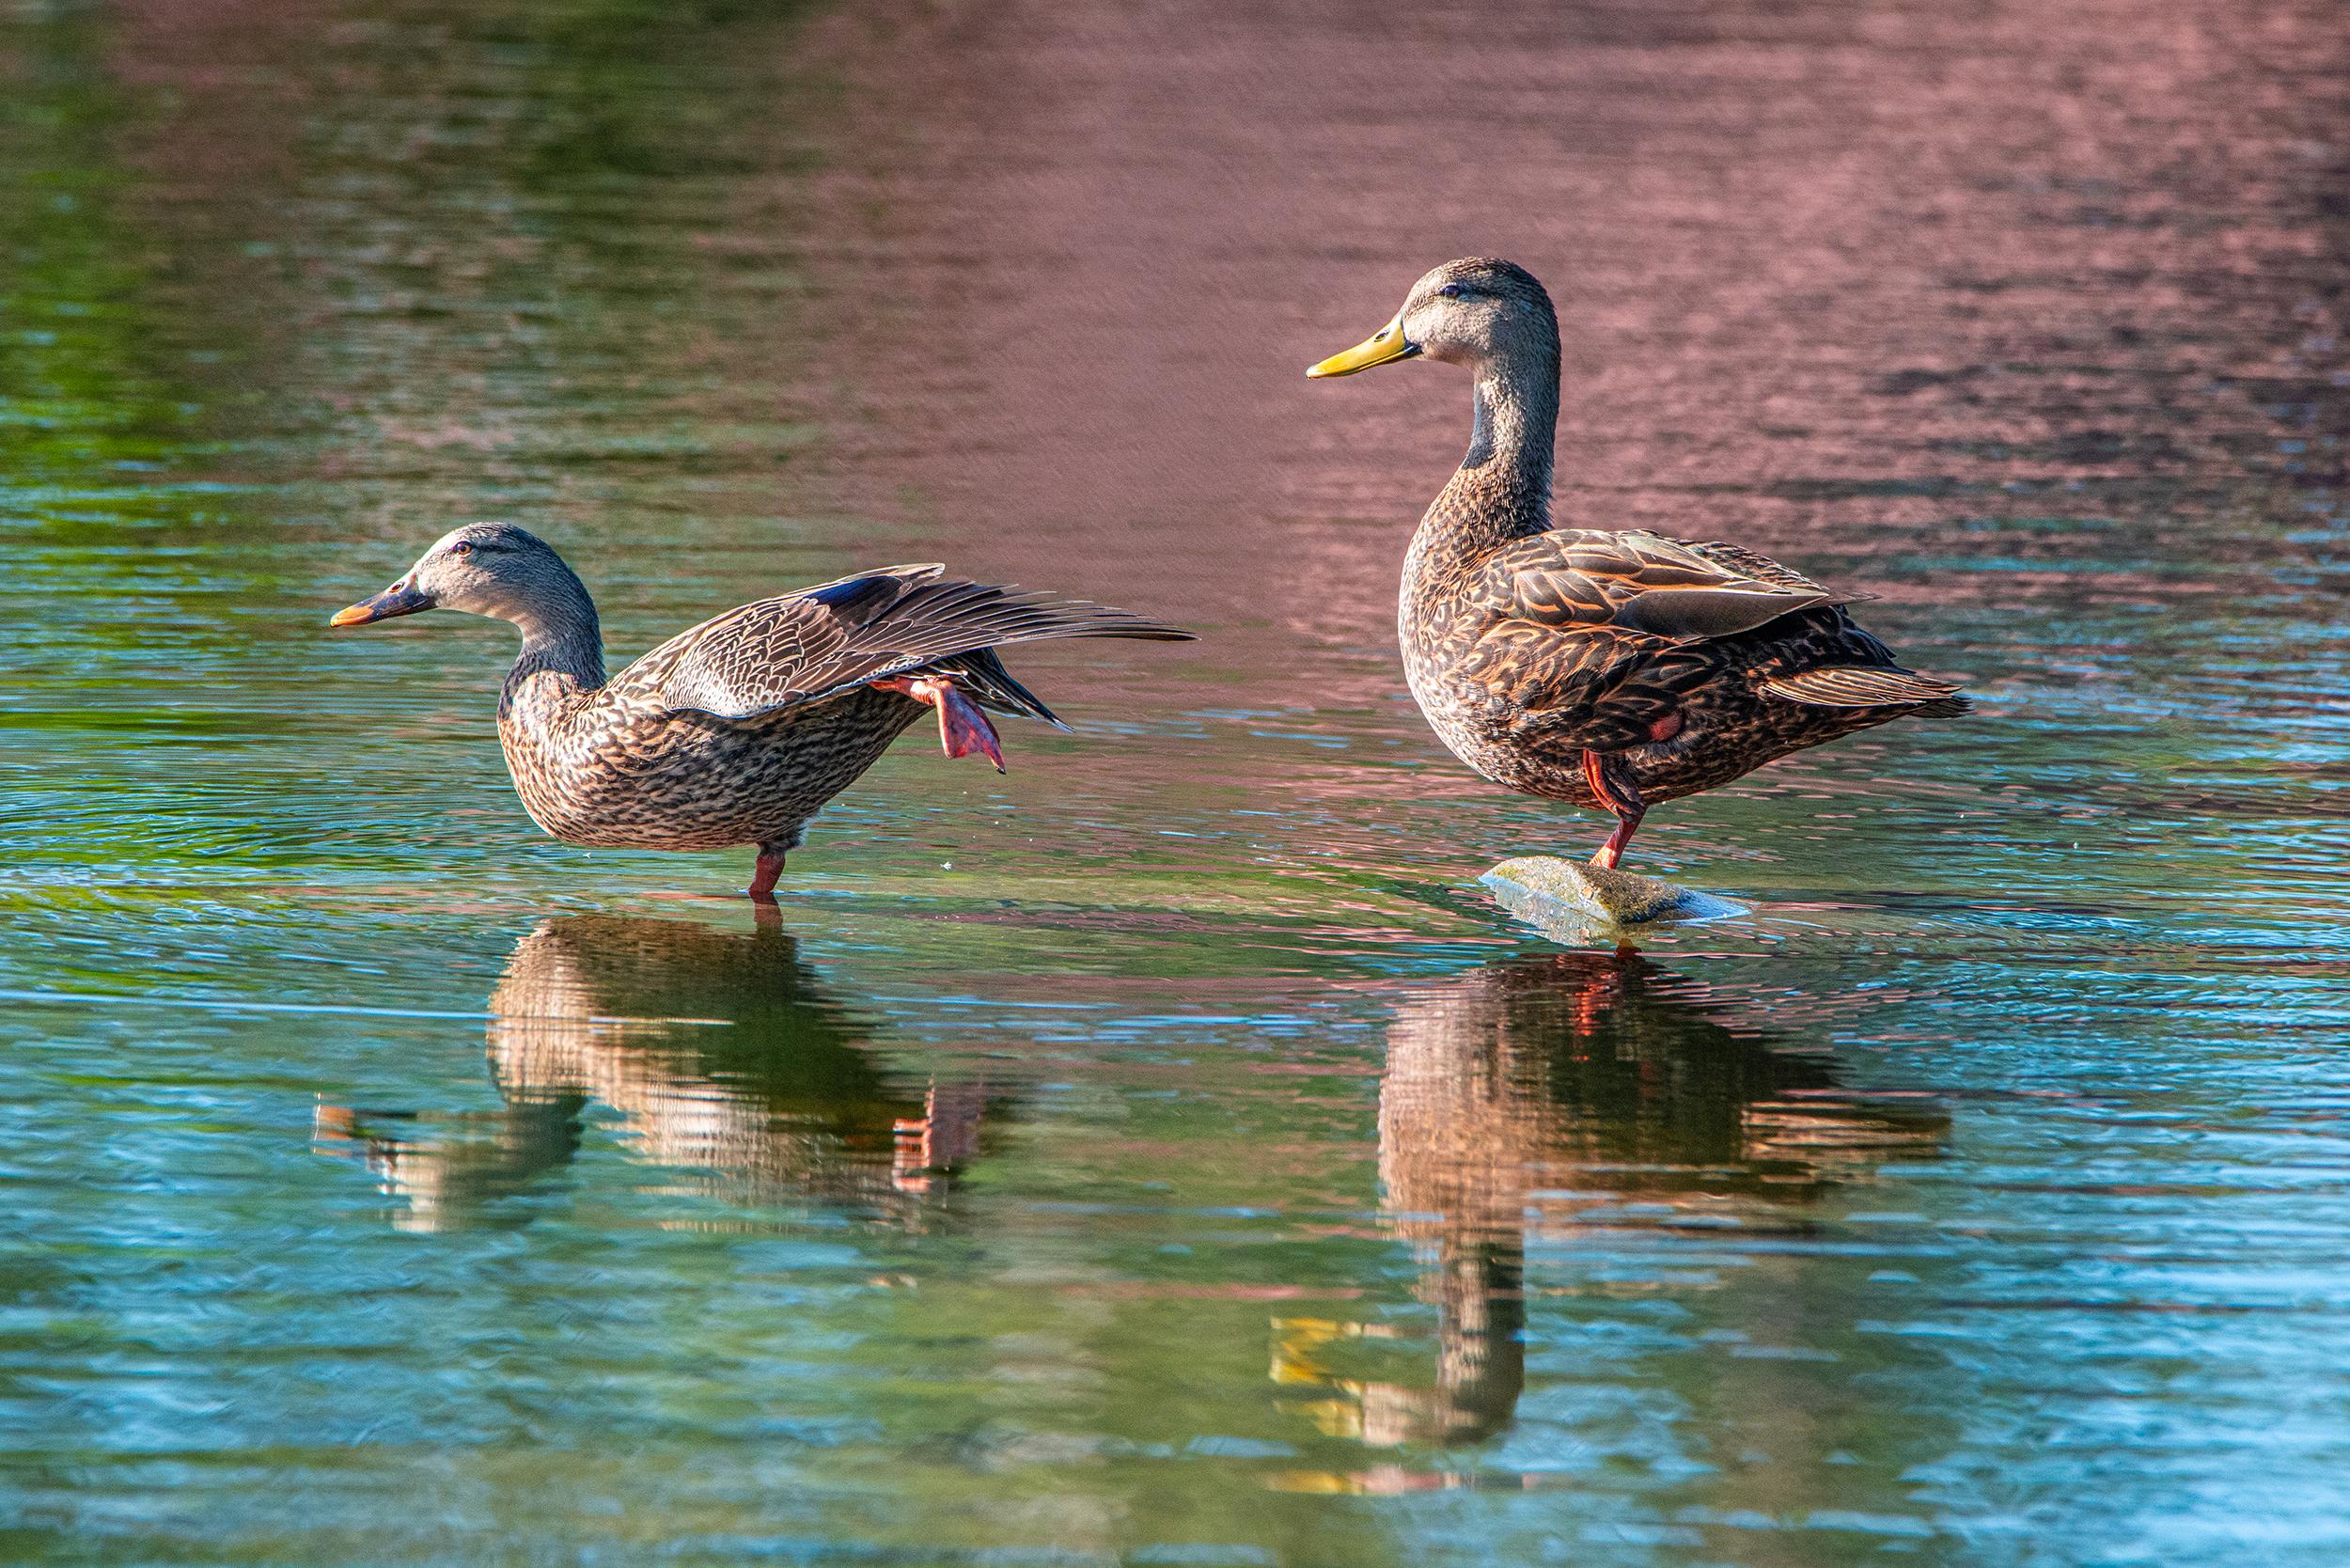 #mallard, #ducks, #mallardduck, #pose, #leg, #female, #pair, #morninglight, #reflection, #lake, #florida, #naples, #nikon, #tamron, #wildlife, #birds